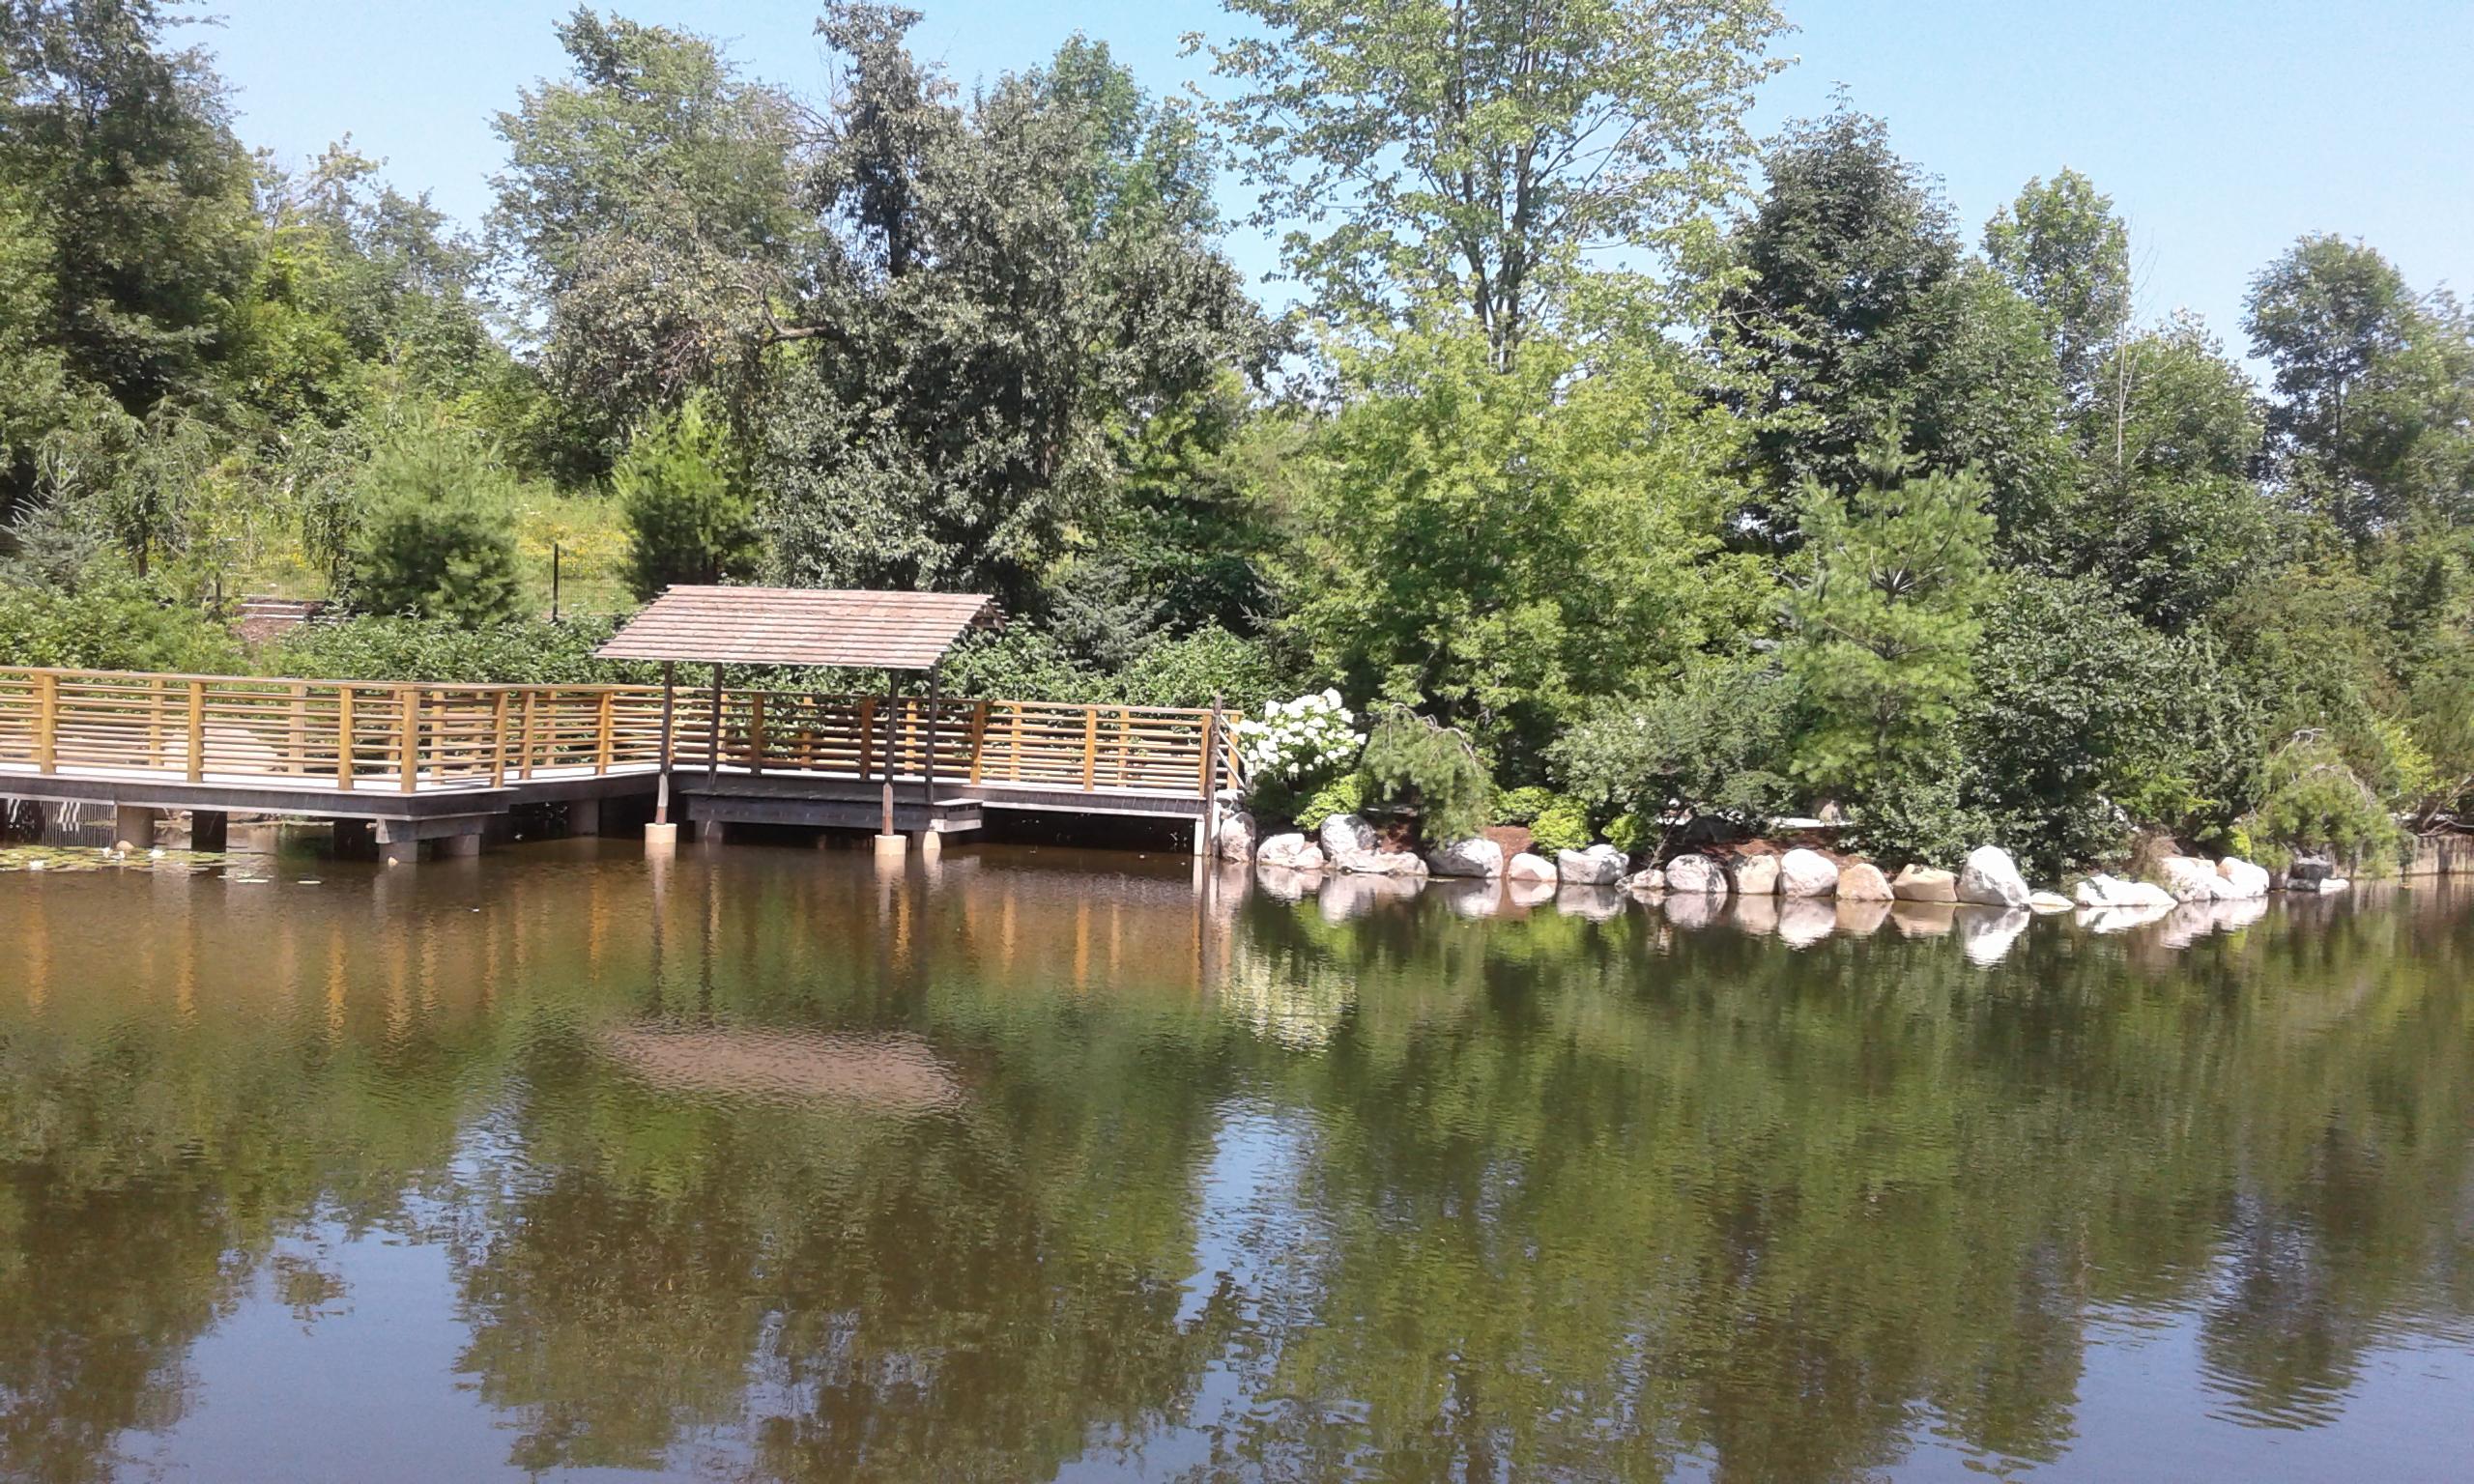 2017 Bus Trip To Meijer Sculpture Botanical Gardens